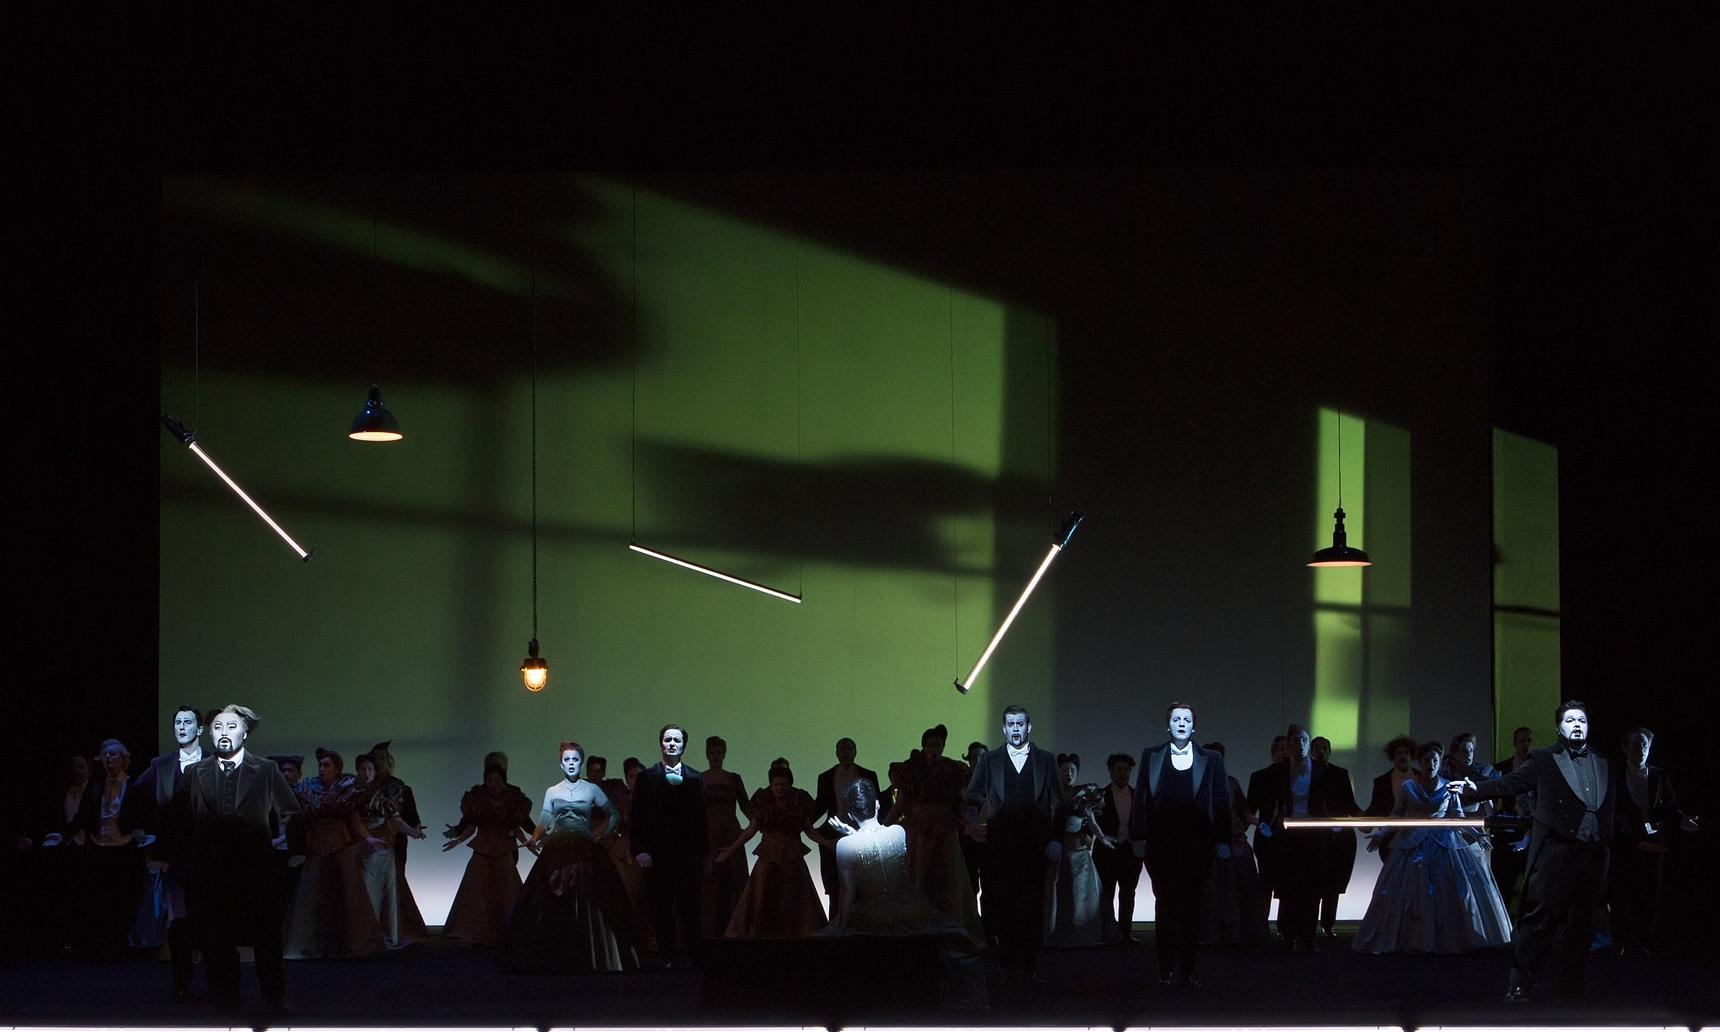 Act 2, Scene 2 - Achrainer (Douphol), Chang (Germont), Handsaker (Flora), Wagner (Marquis), Lee (Violetta), Nekel (Doctor), Schmidlechner (Gaston), le Roux (Alfredo), Chorus. Linz, 2015